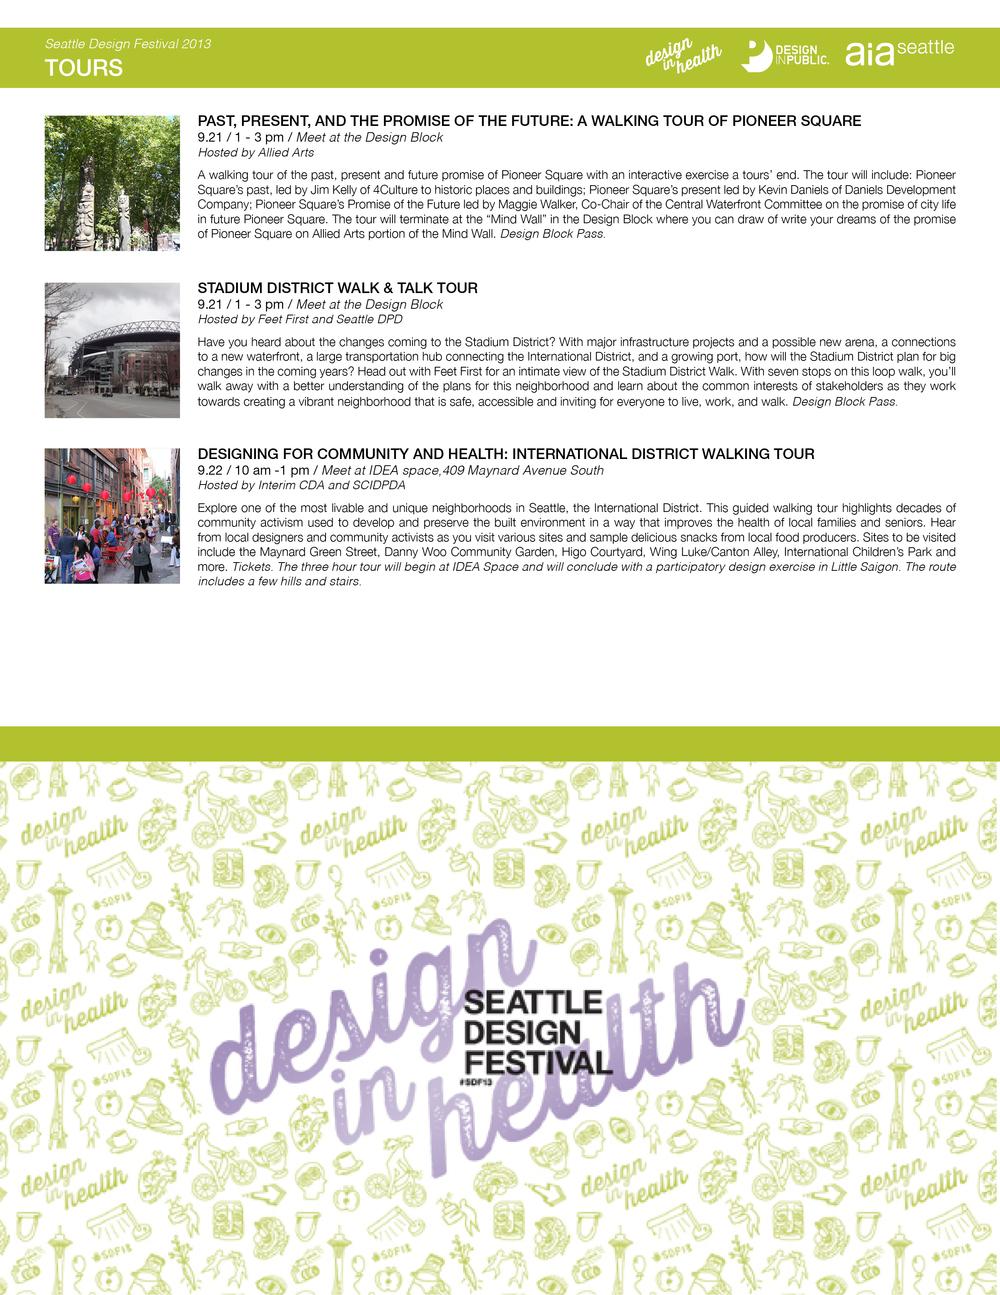 SDF13_festival program_of_events_web211.jpg